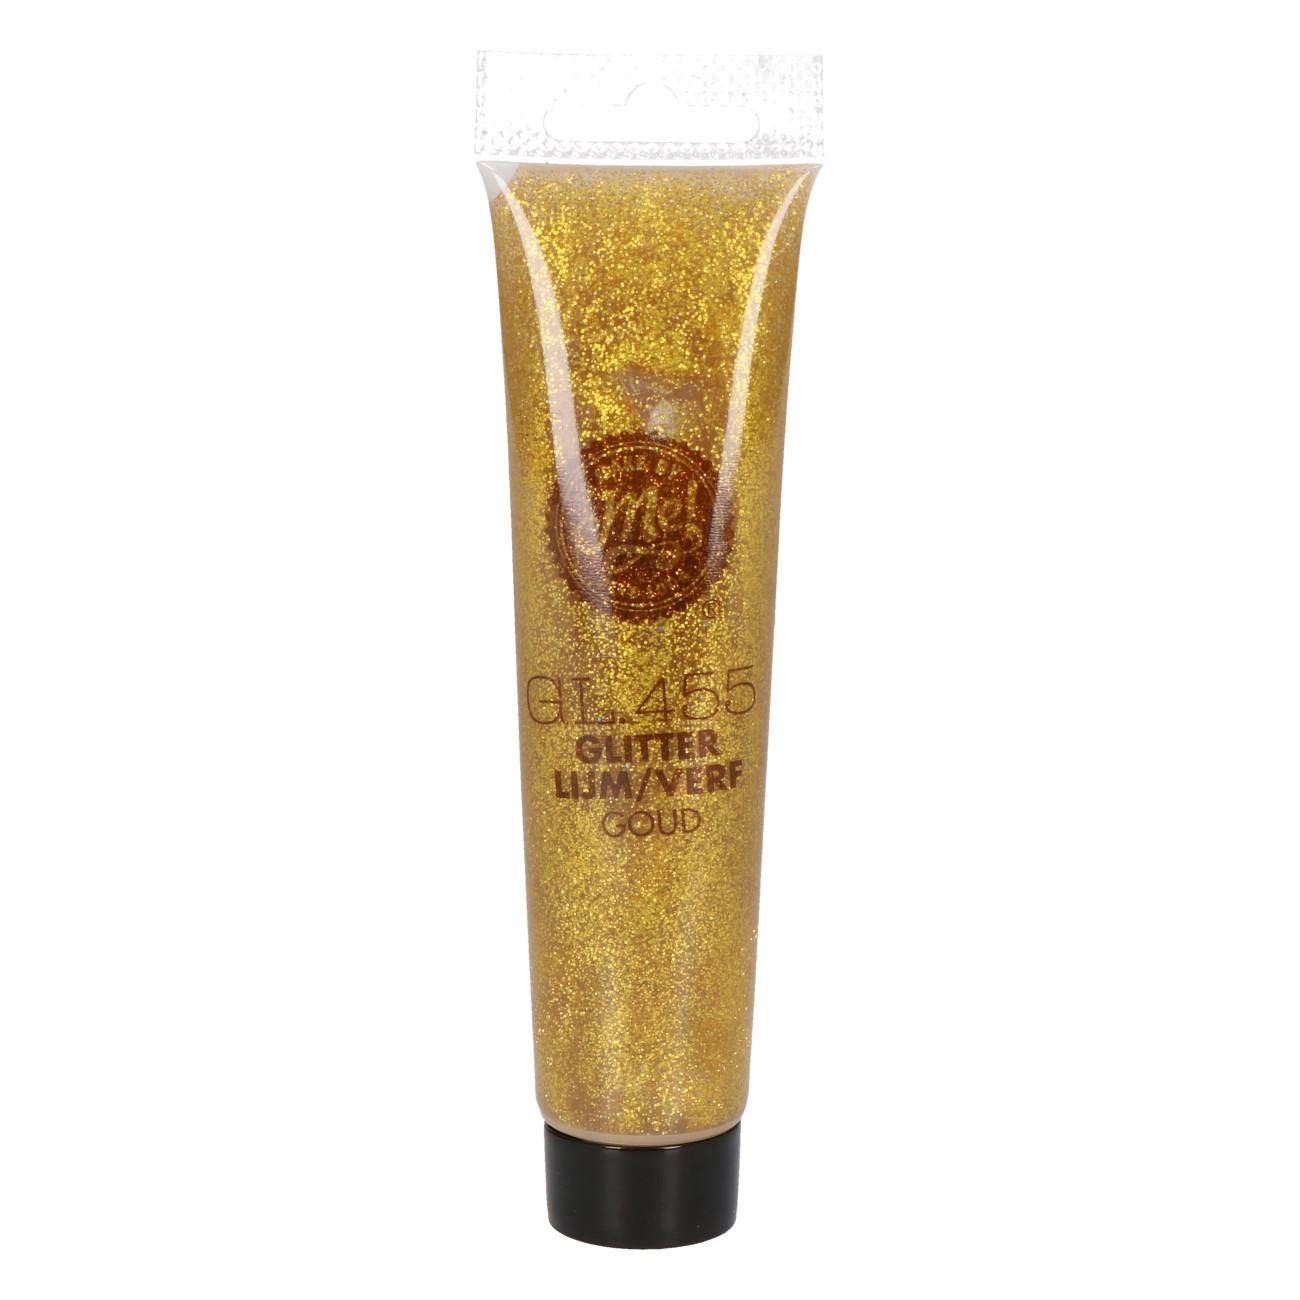 Glitterlijm/verf goud GL455 75ml